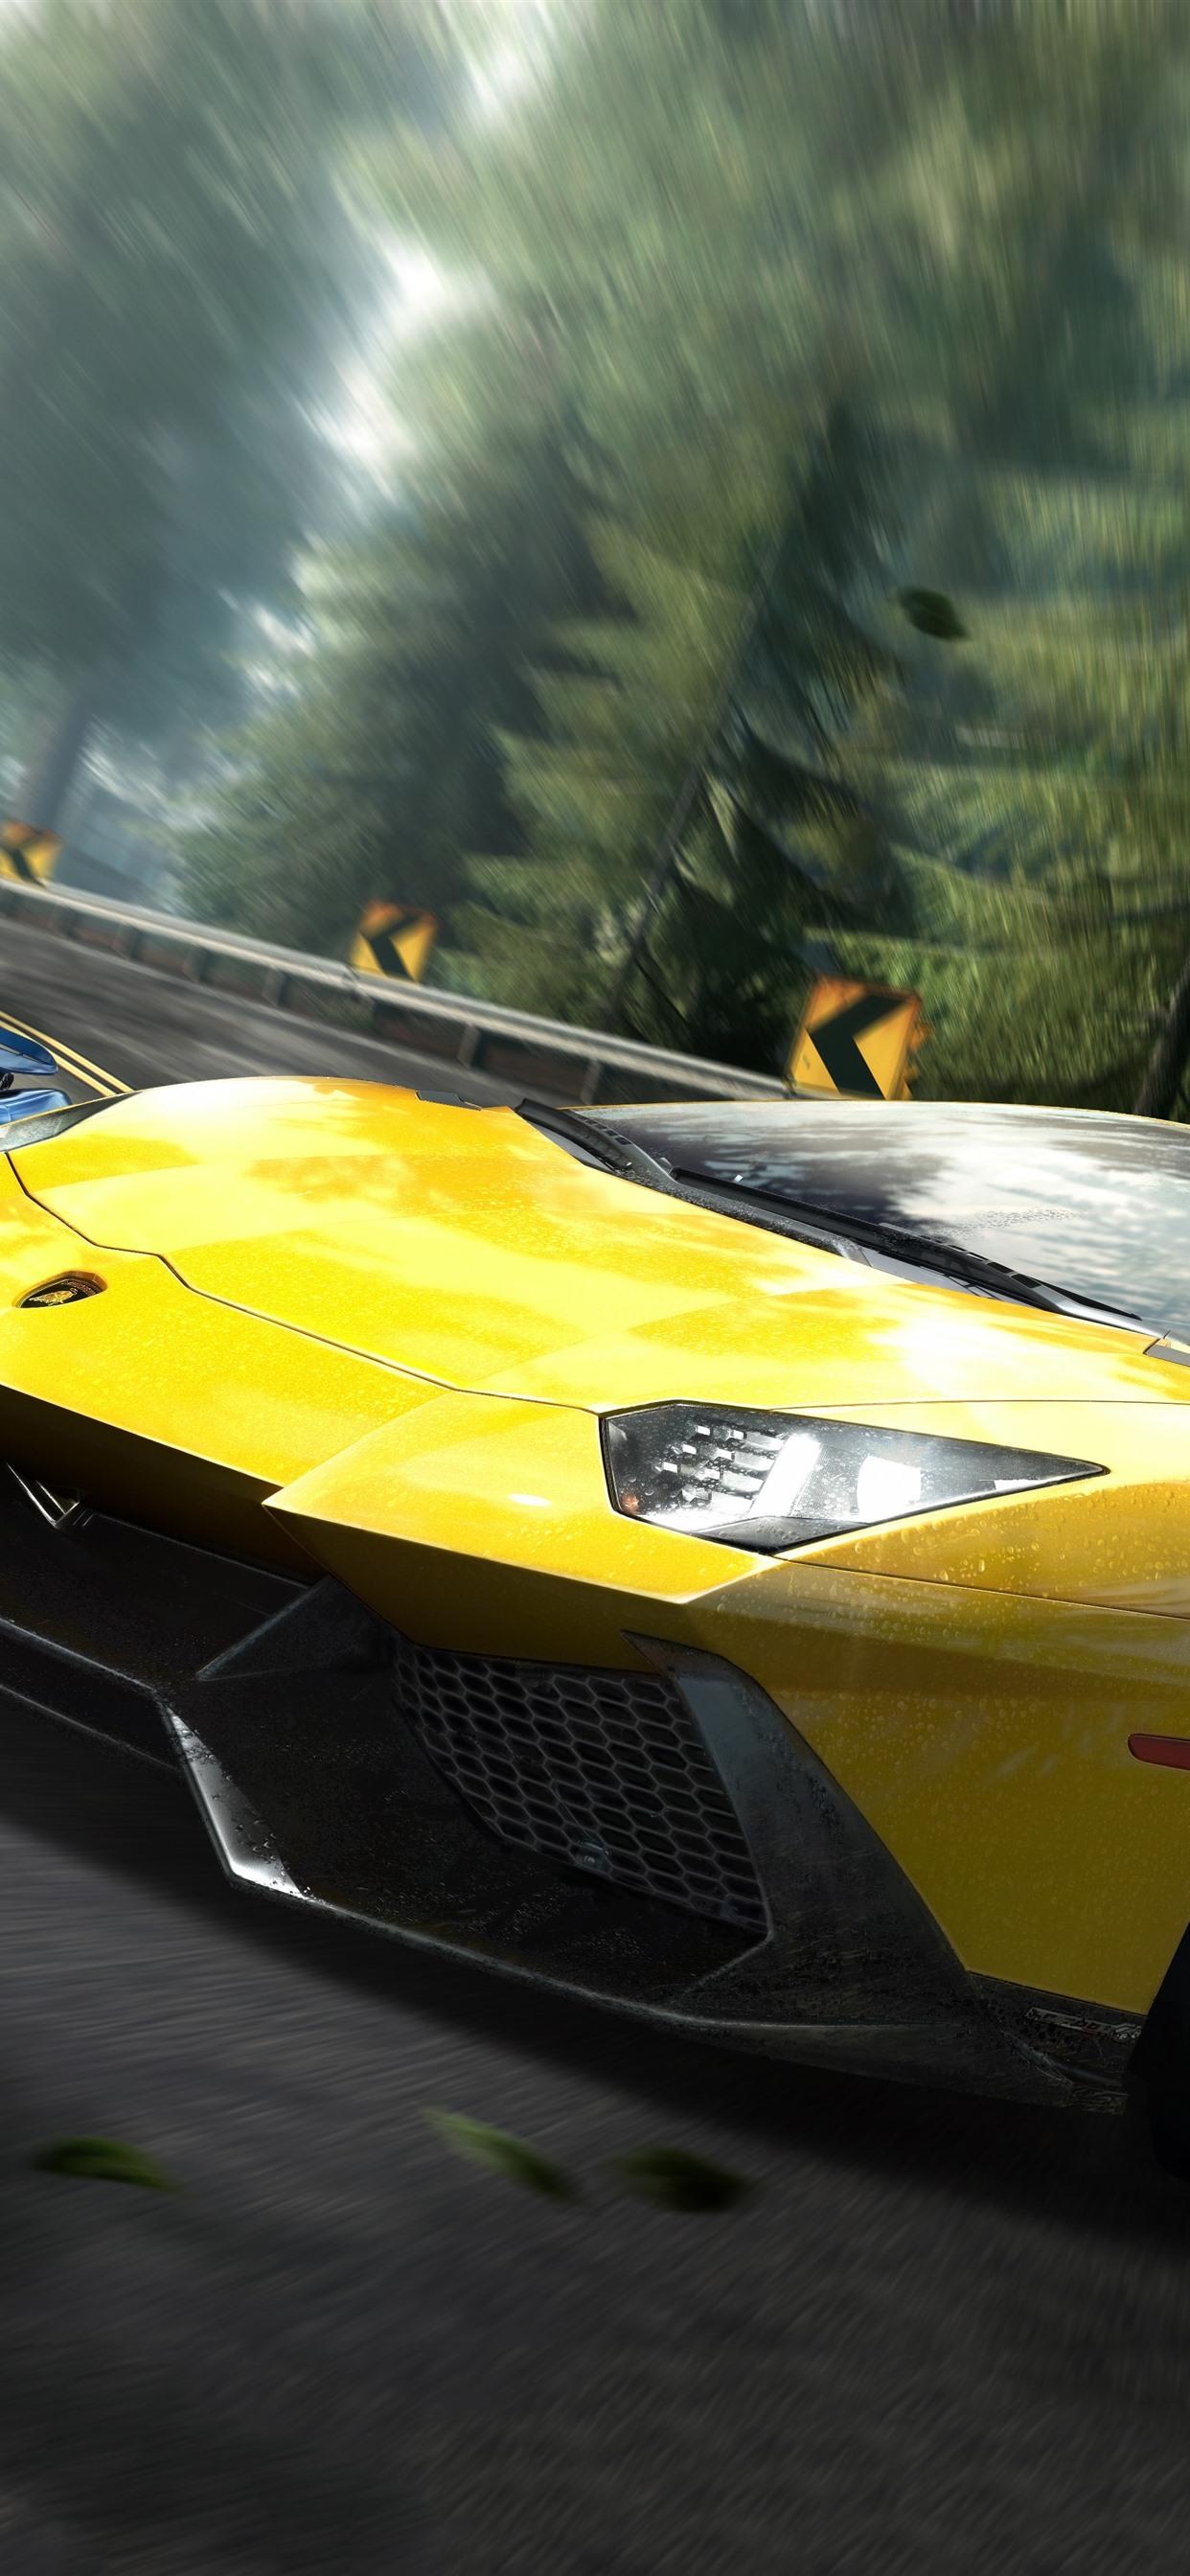 Need For Speed Lamborghini Yellow Supercar 1242x2688 Iphone 11